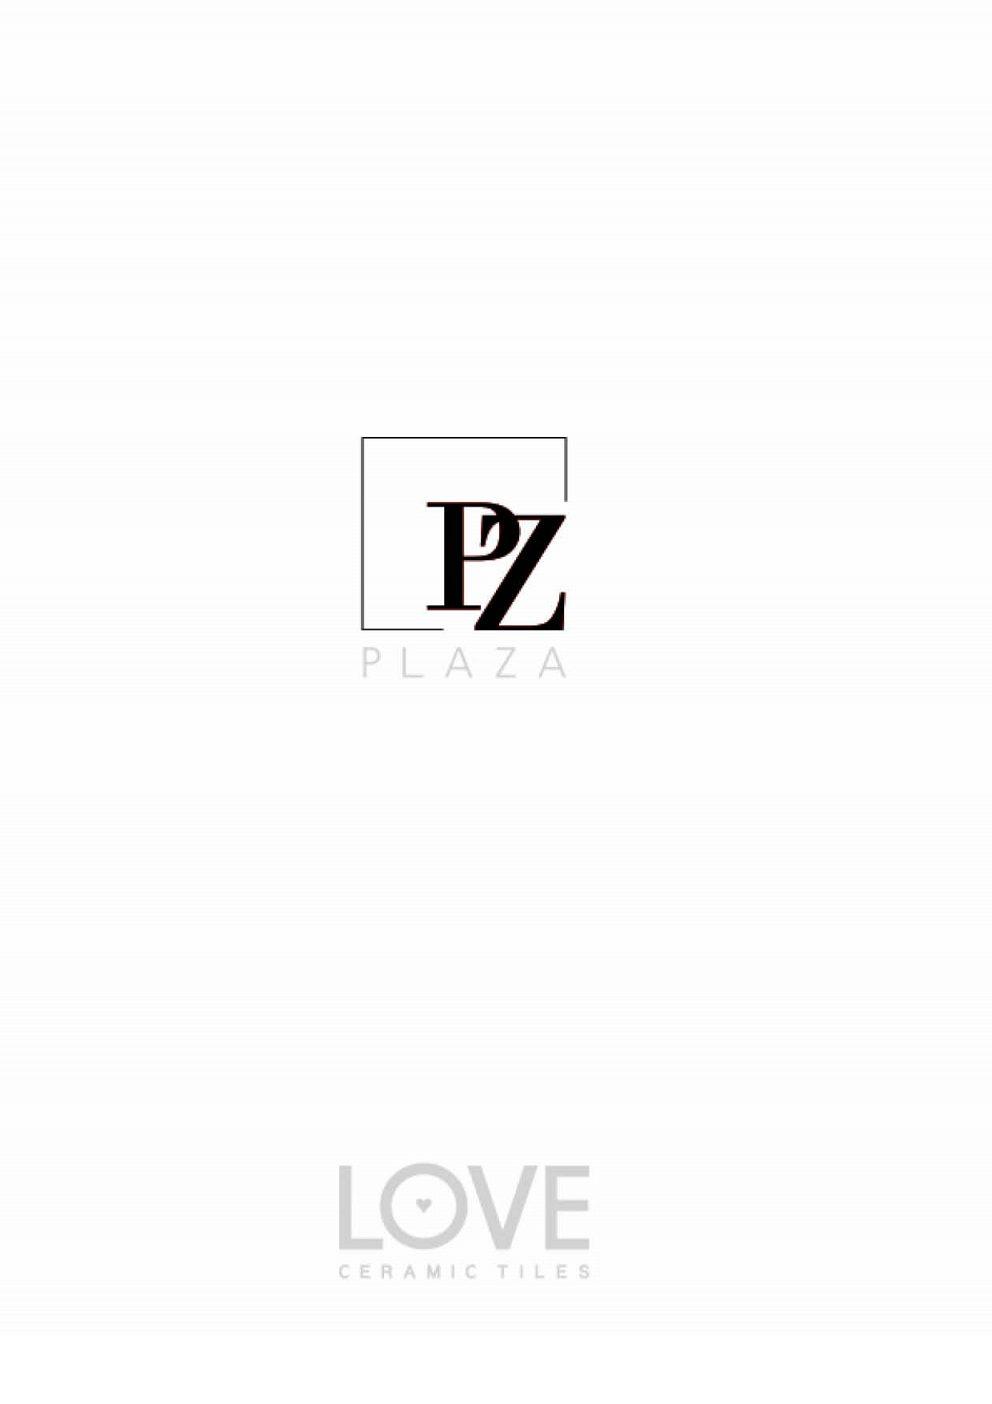 Love - Plaza